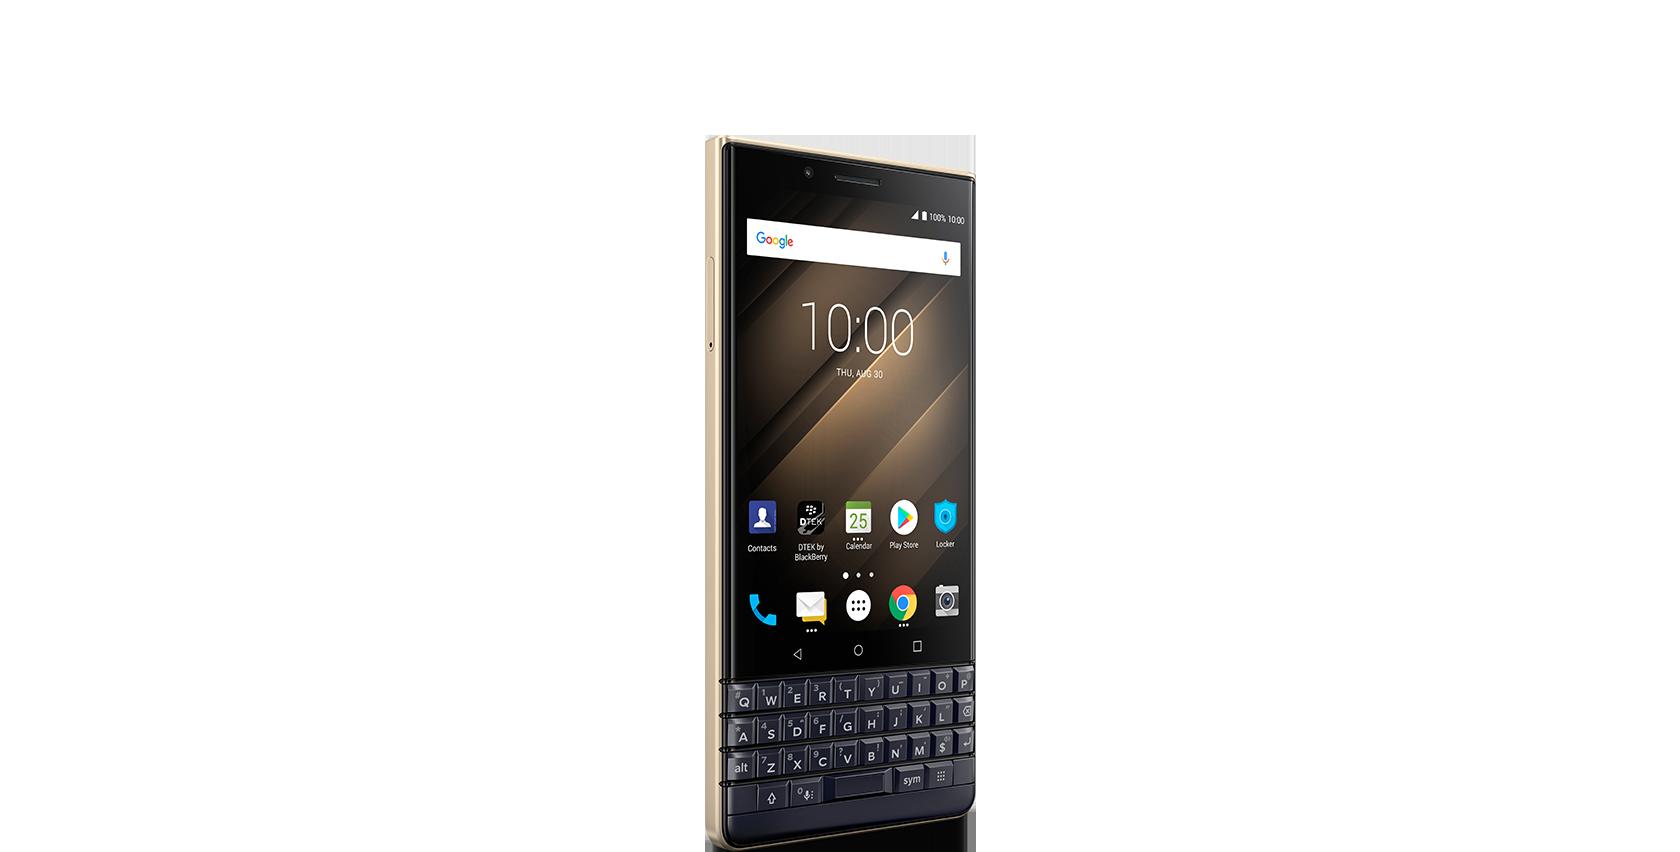 key 2 le champagne - BlackBerry KEY 2 LE